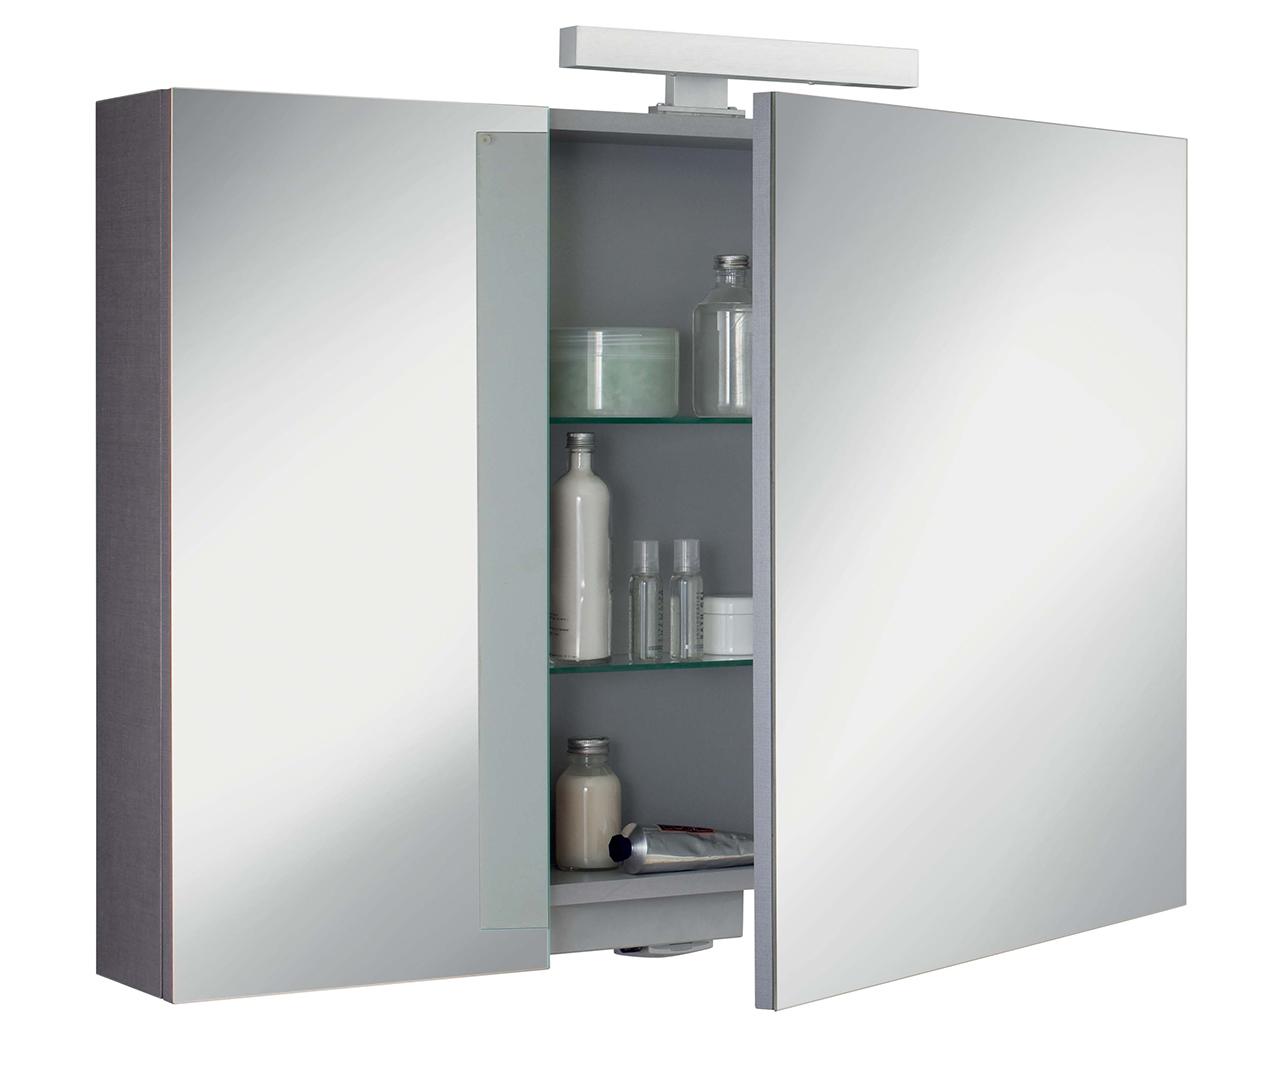 Gamme box armoire de salle de bain armoire toilette sanijura - Meuble rangement wc castorama ...